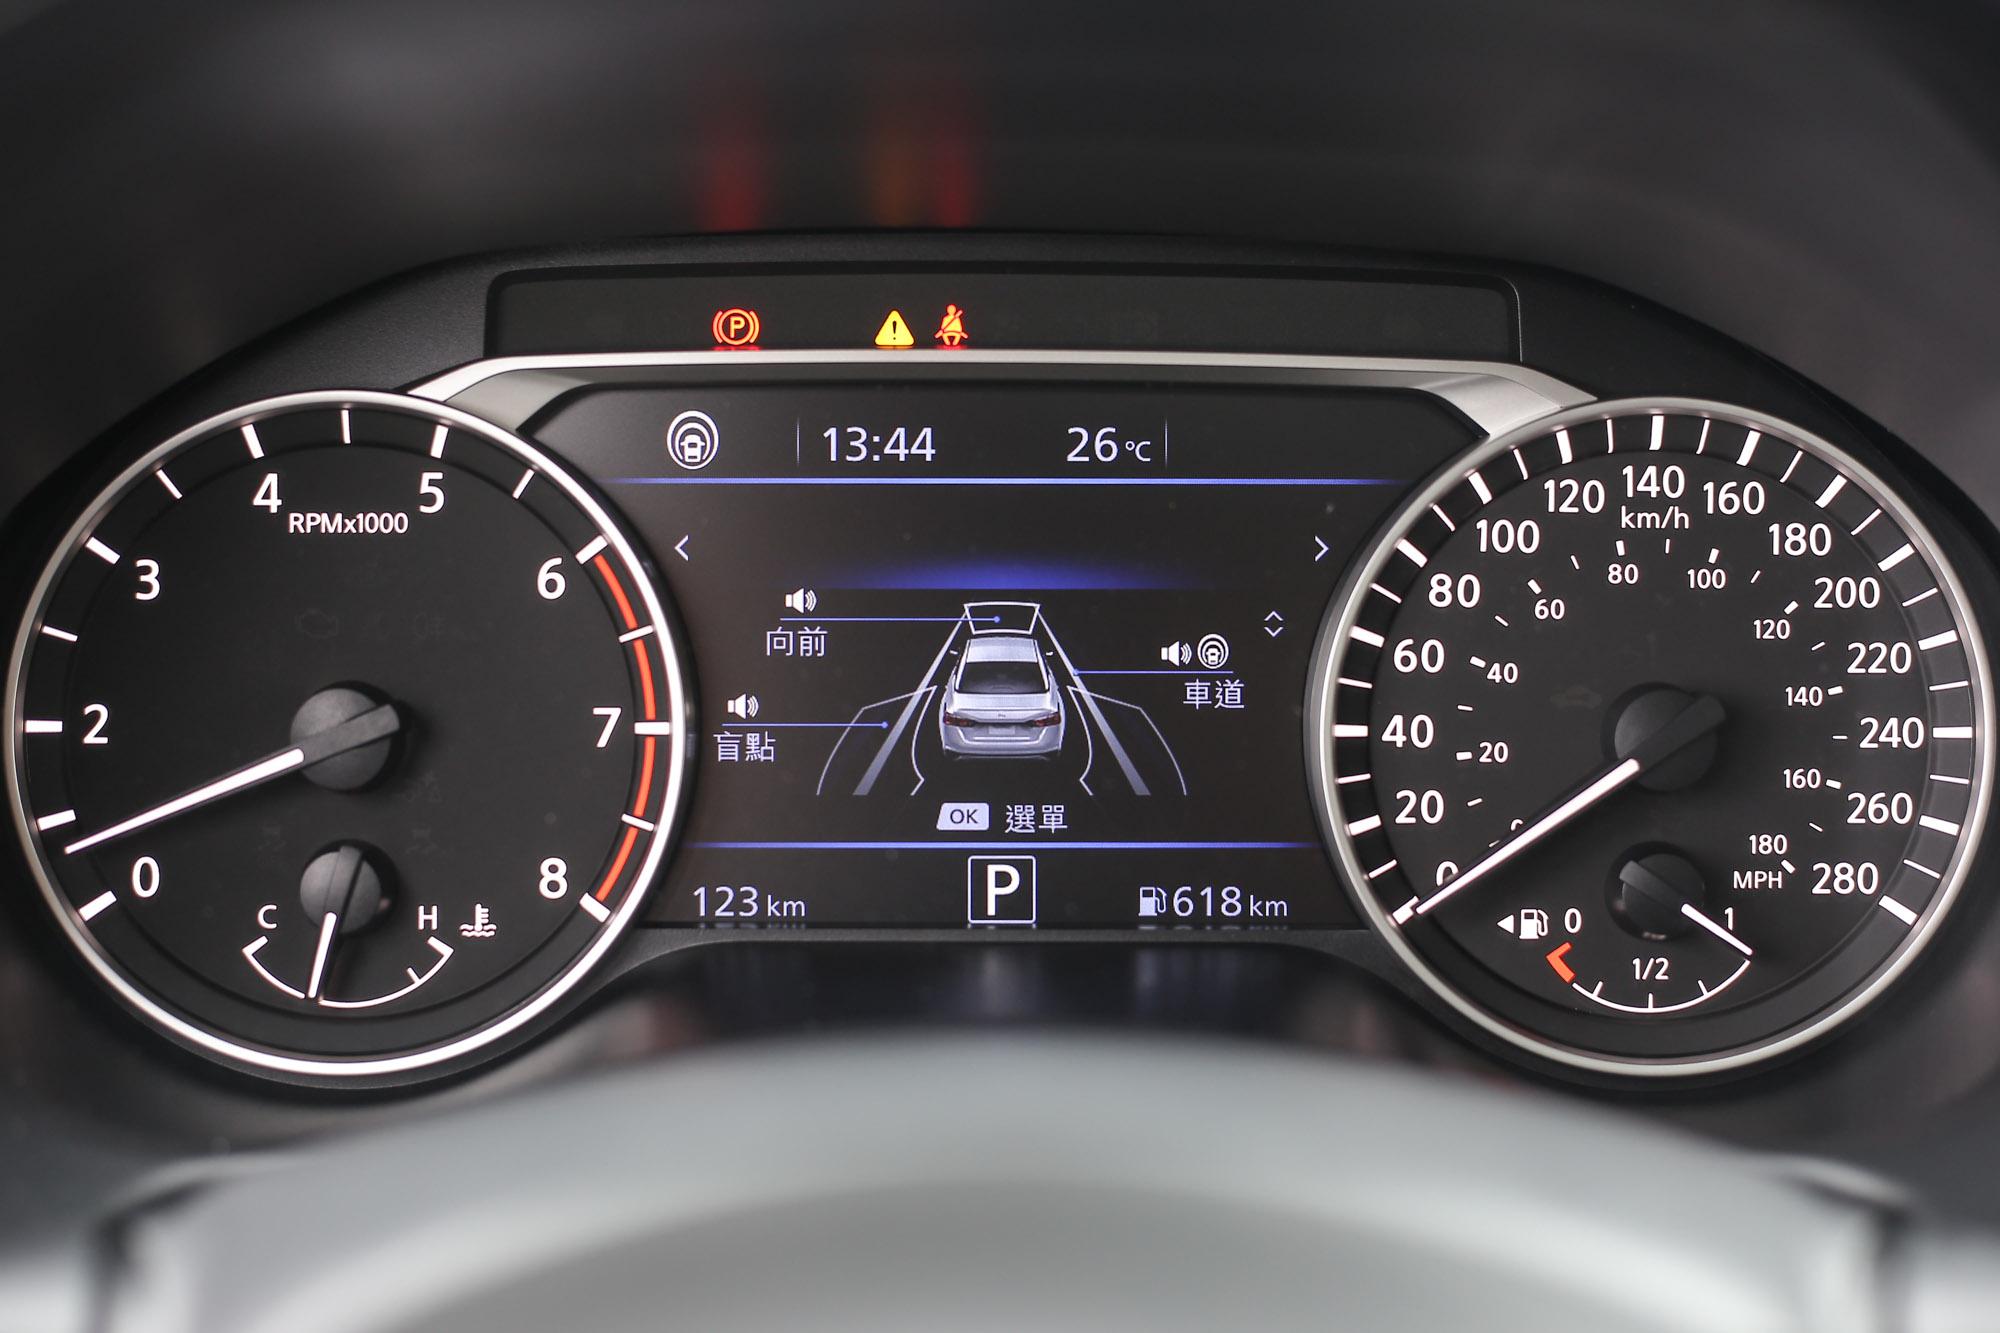 儀表資訊幕提供 Nissan Intelligent Mobility 的跟車系統、車道預防及盲點偵測資訊。